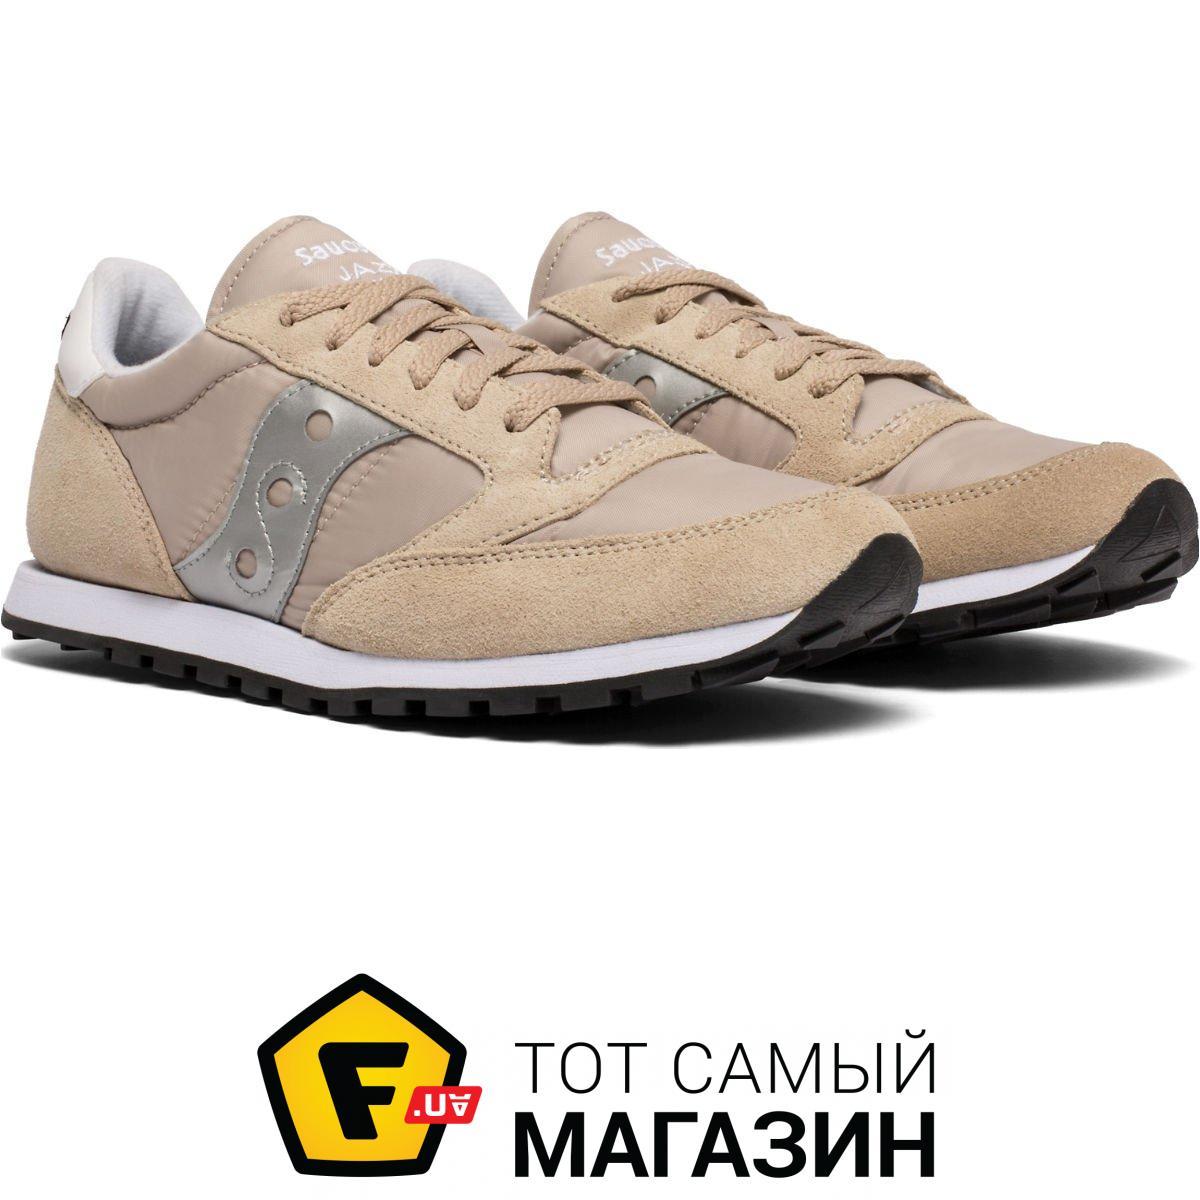 online store 39b60 bd91f Saucony Jazz Low Pro Euro 9.5, tan/silver (2866-269s)